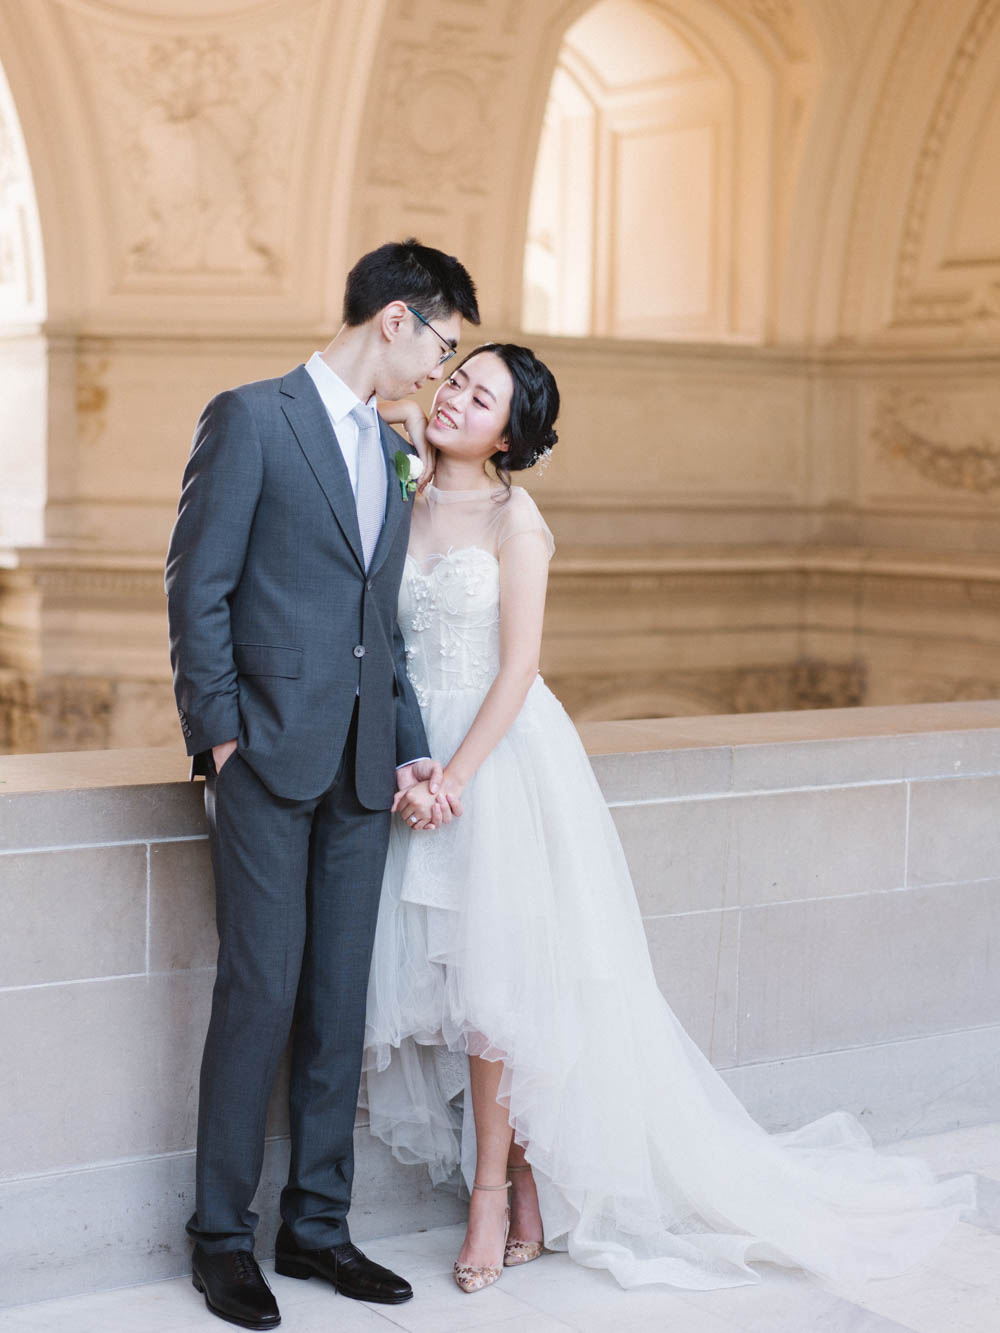 San Francisco Wedding Photographer - City Hall - Pinnel Photography-02951.jpg